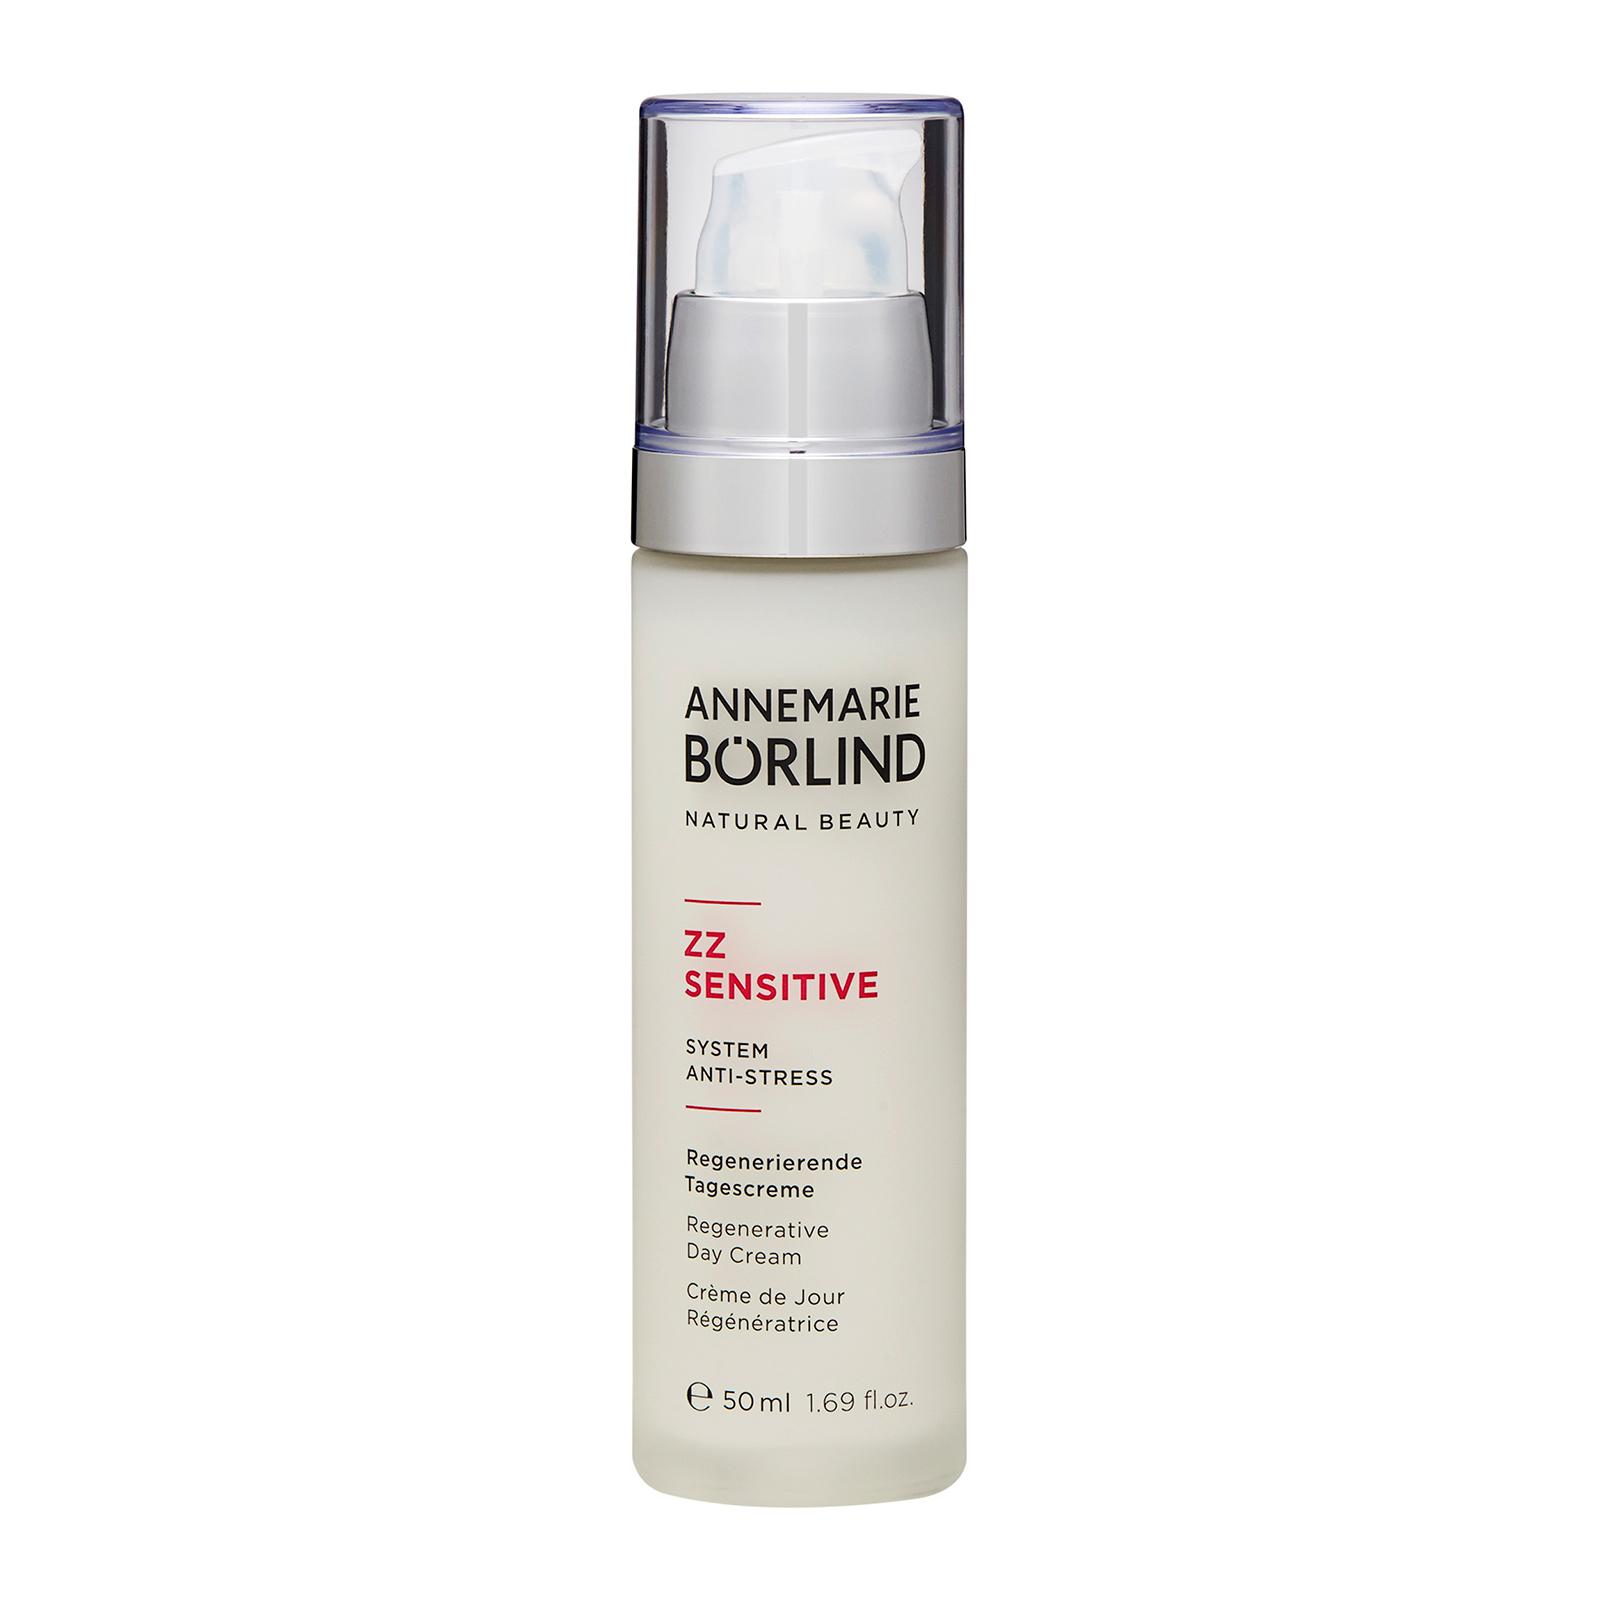 Annemarie Borlind ZZ Sensitive Regenerative Day Cream 1.69oz, 50ml